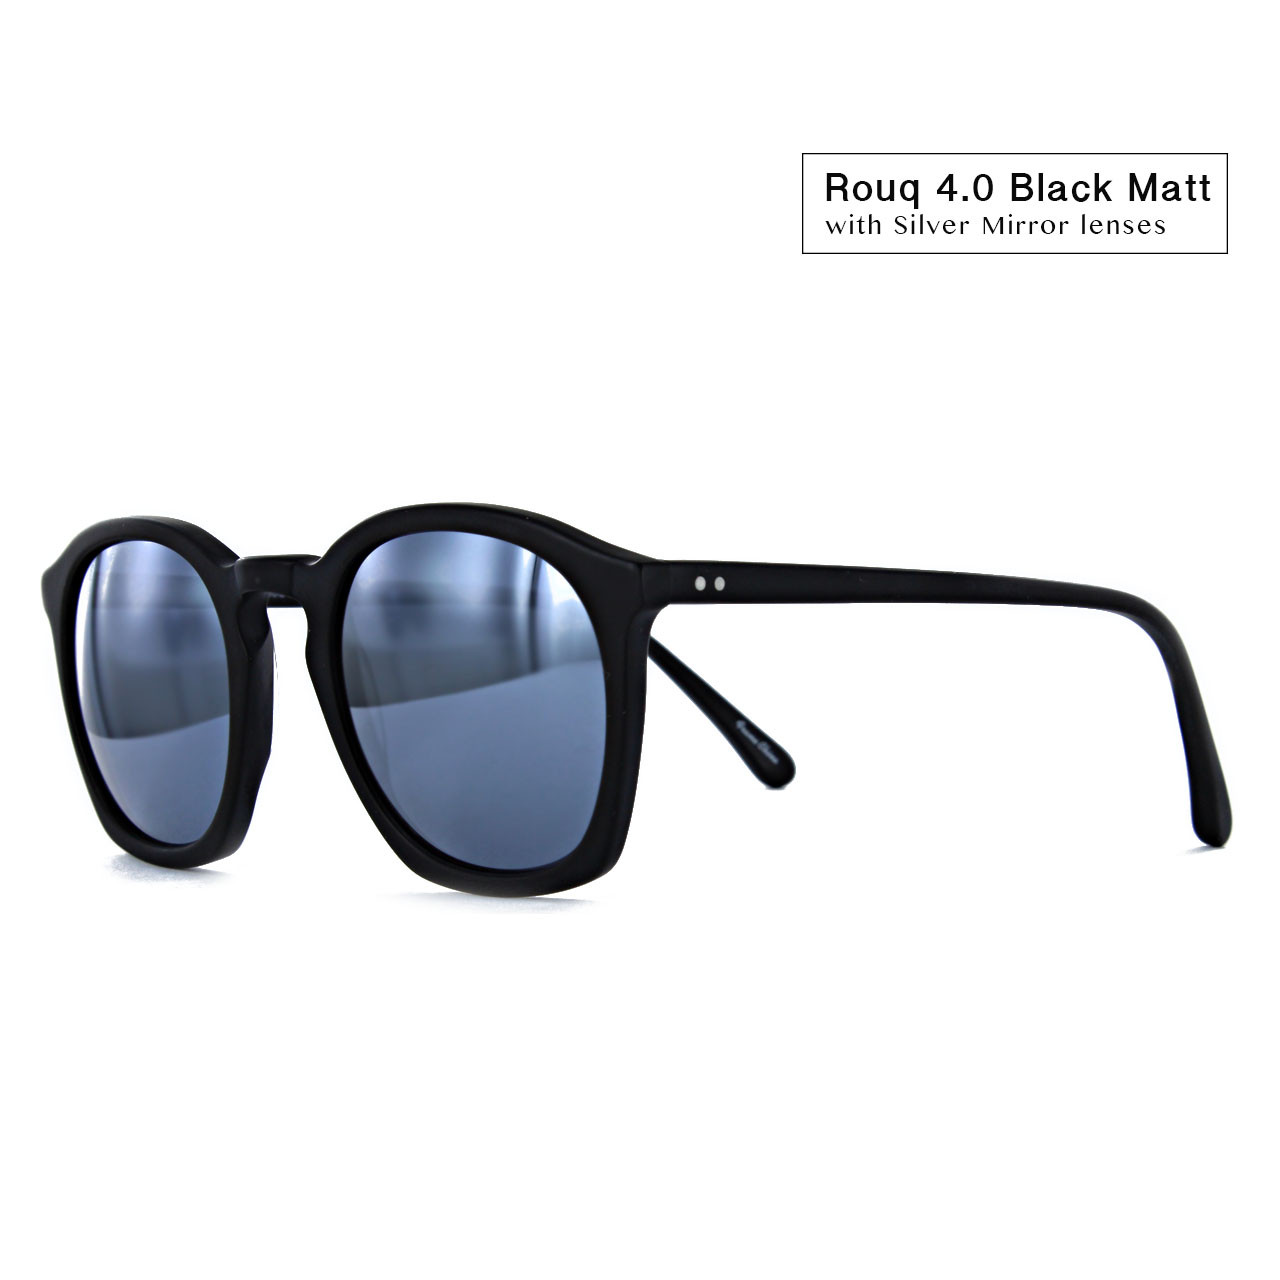 Rouq 4.0 Black Matt with Silver Mirror Lenses